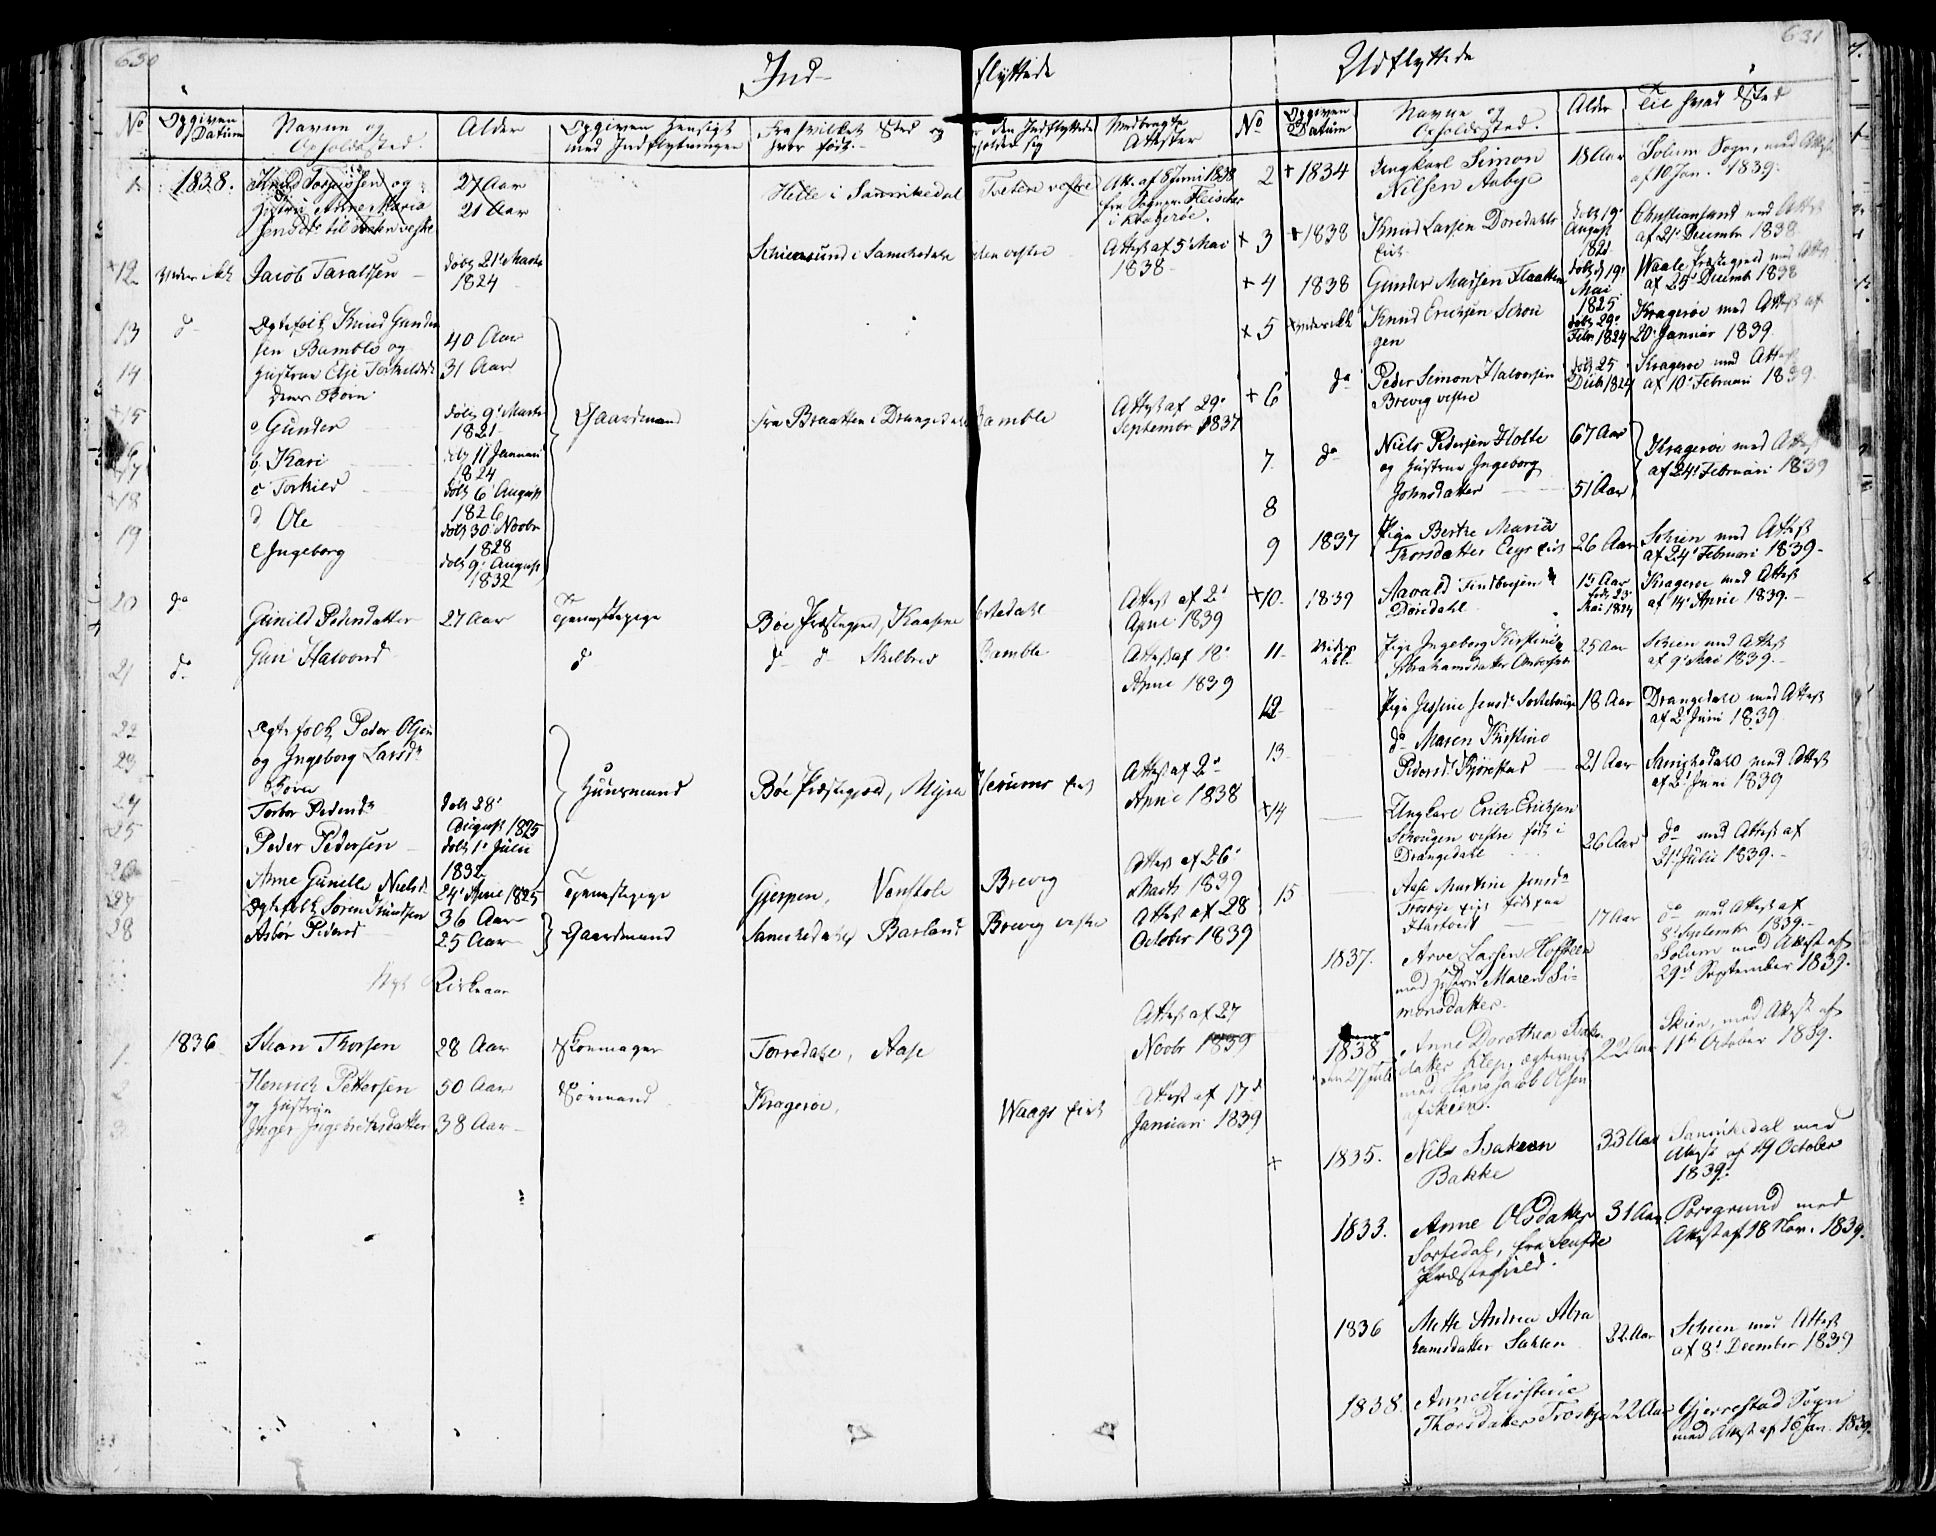 SAKO, Bamble kirkebøker, F/Fa/L0004: Ministerialbok nr. I 4, 1834-1853, s. 630-631